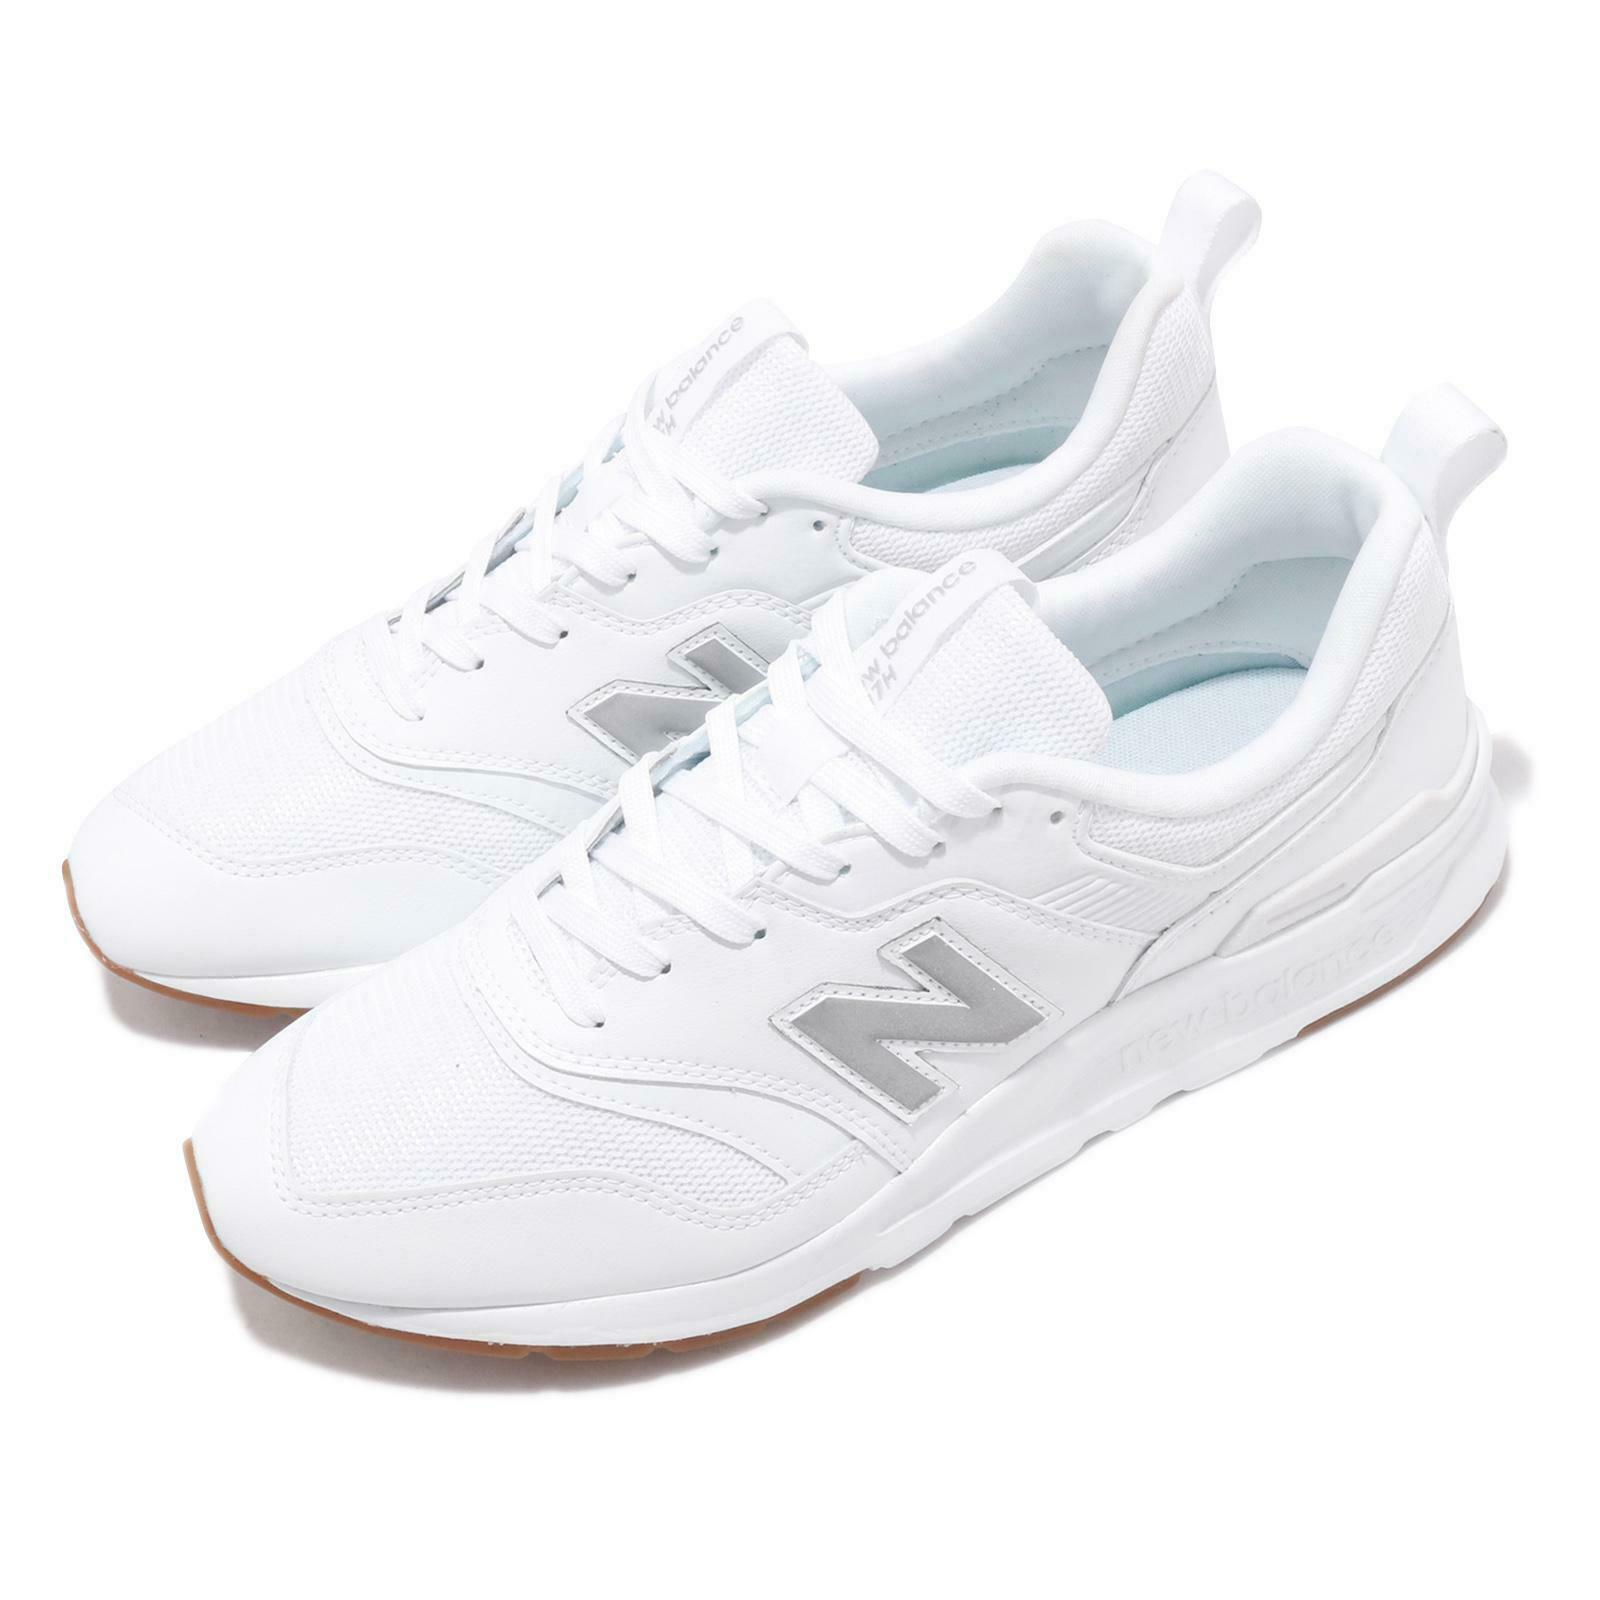 CM997HCN D blancoo Plata New Balance Goma De Mascar Hombres Running Zapatos TENIS CM 997 hcnd